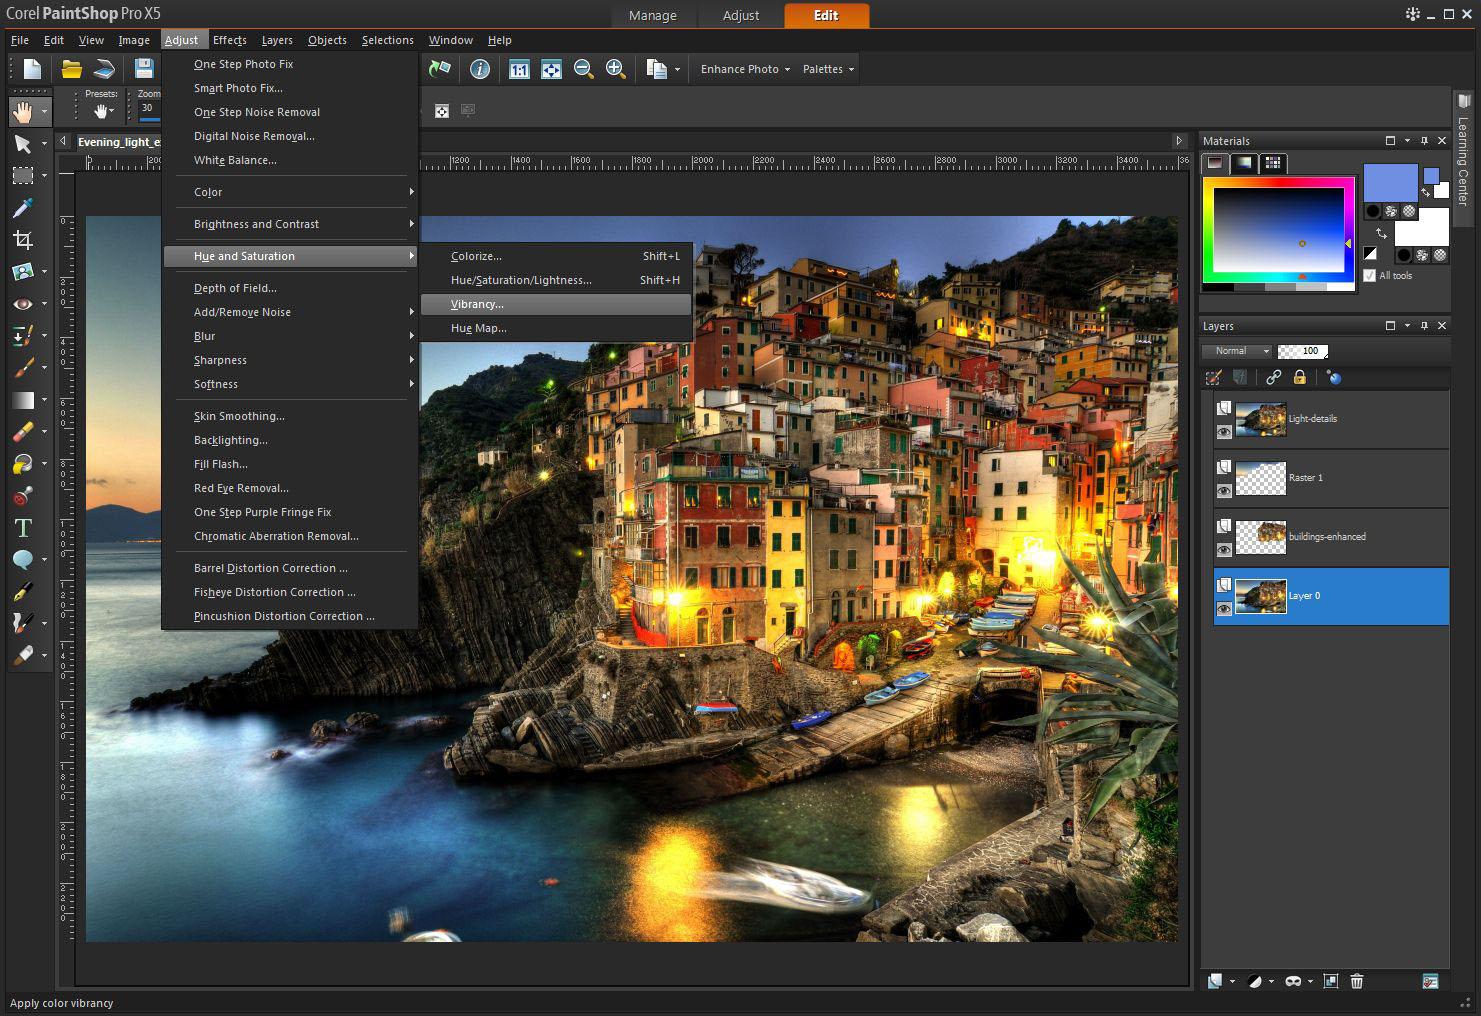 4006_corel_paint-shop_pro_x5_screenshot_lg.jpg